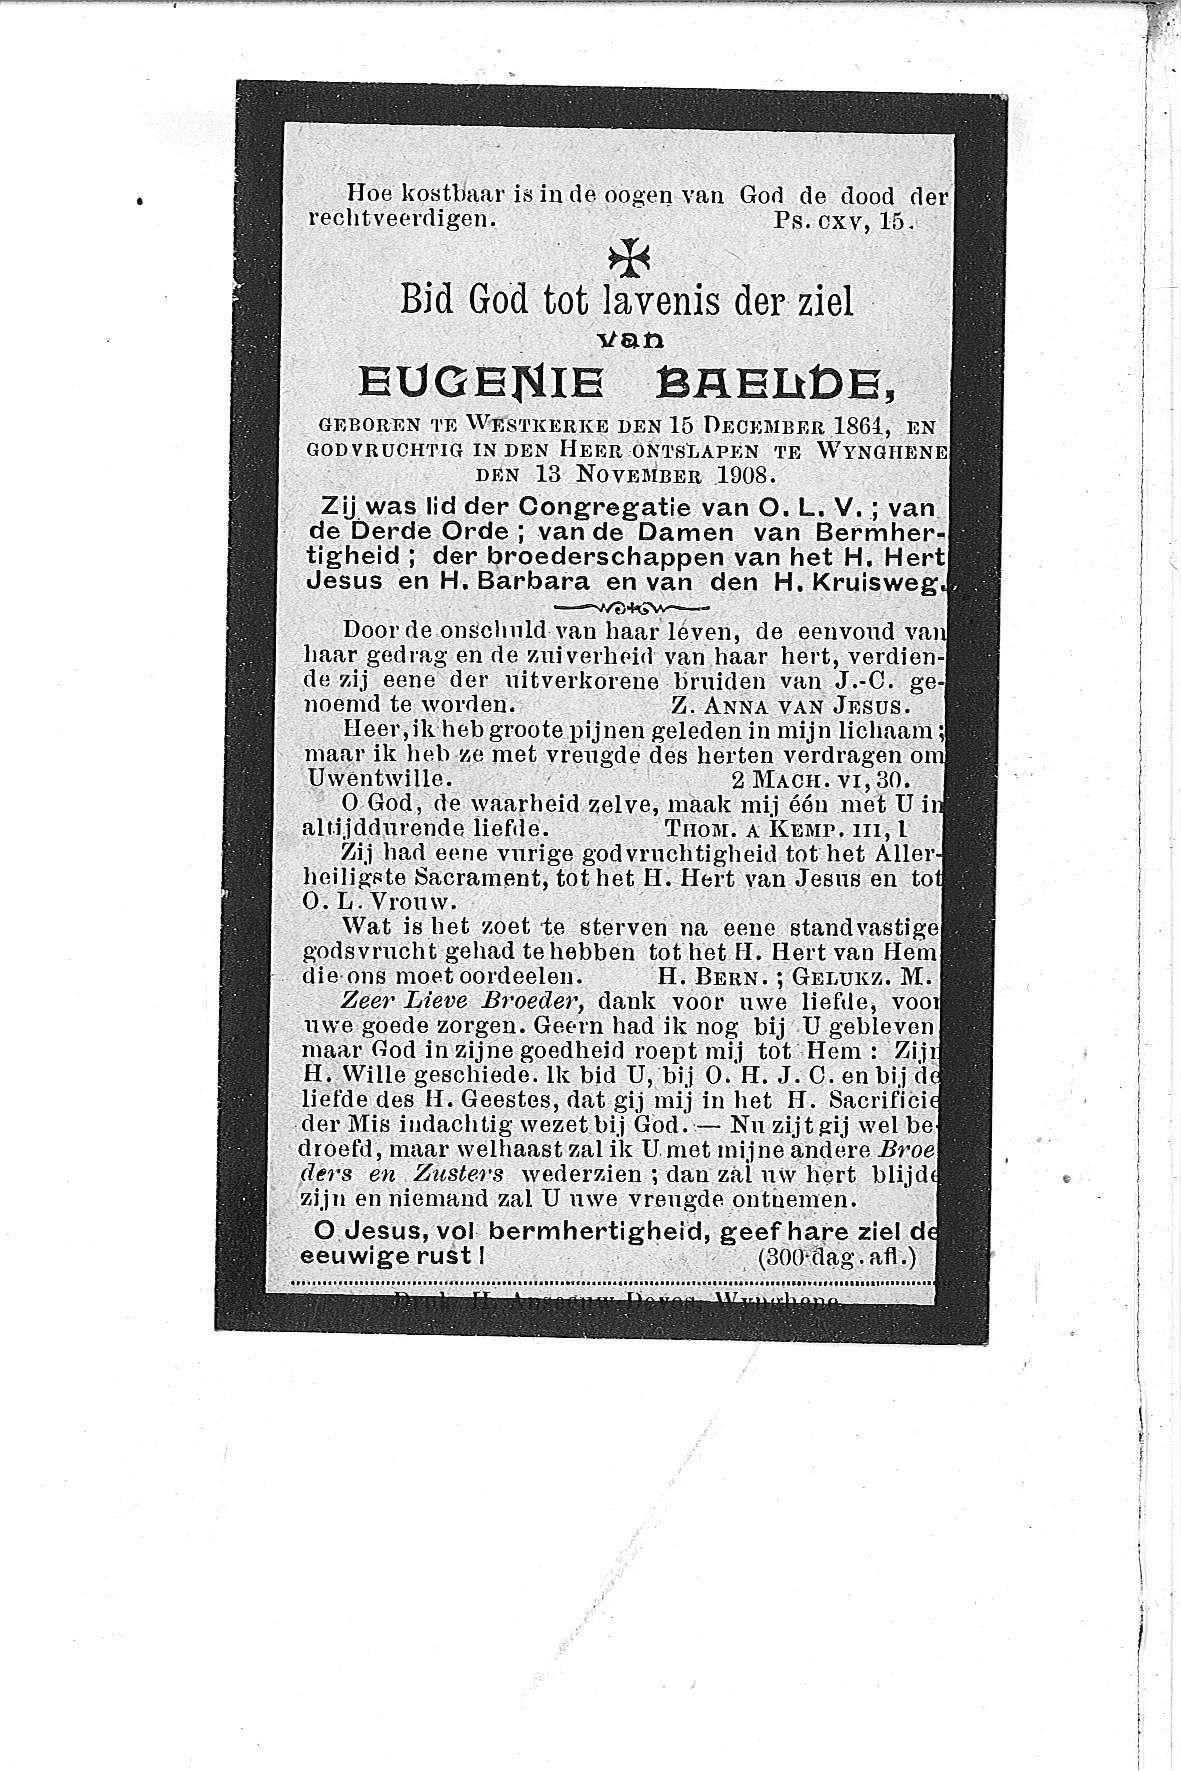 Eugenie(1908)20100928110430_00025.jpg